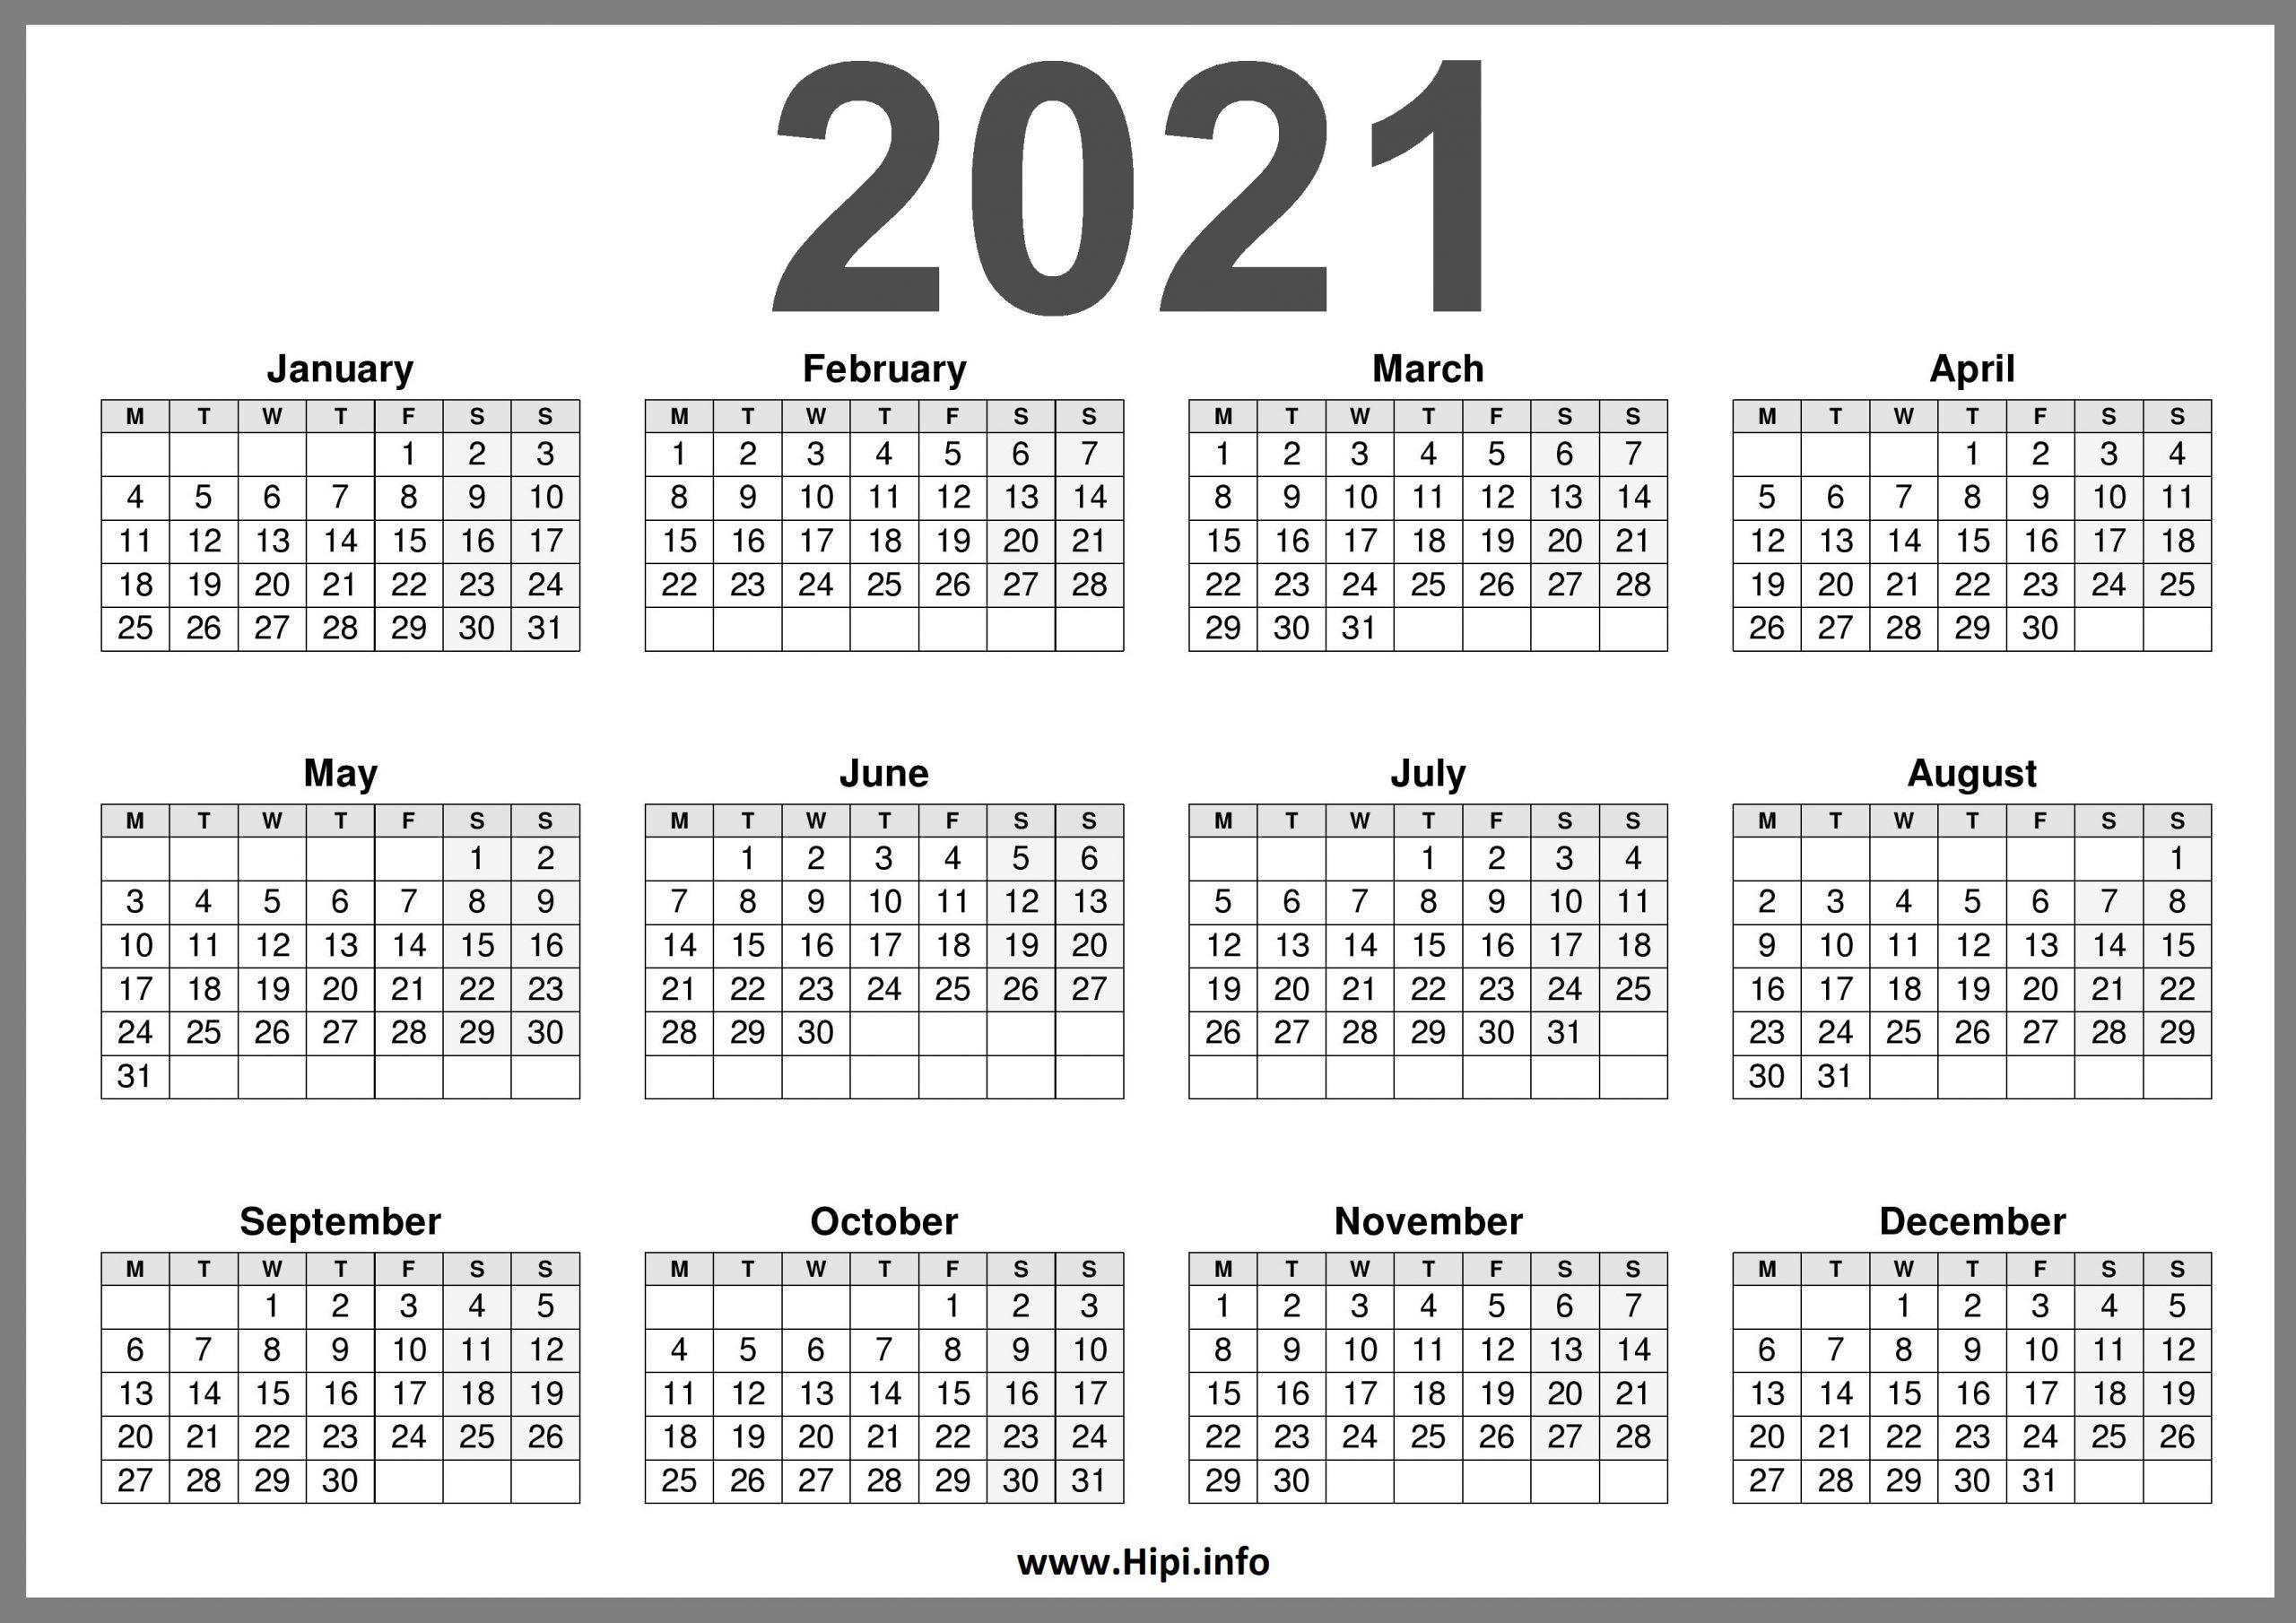 2021 Printable Calendar Uk United Kingdom Hipi